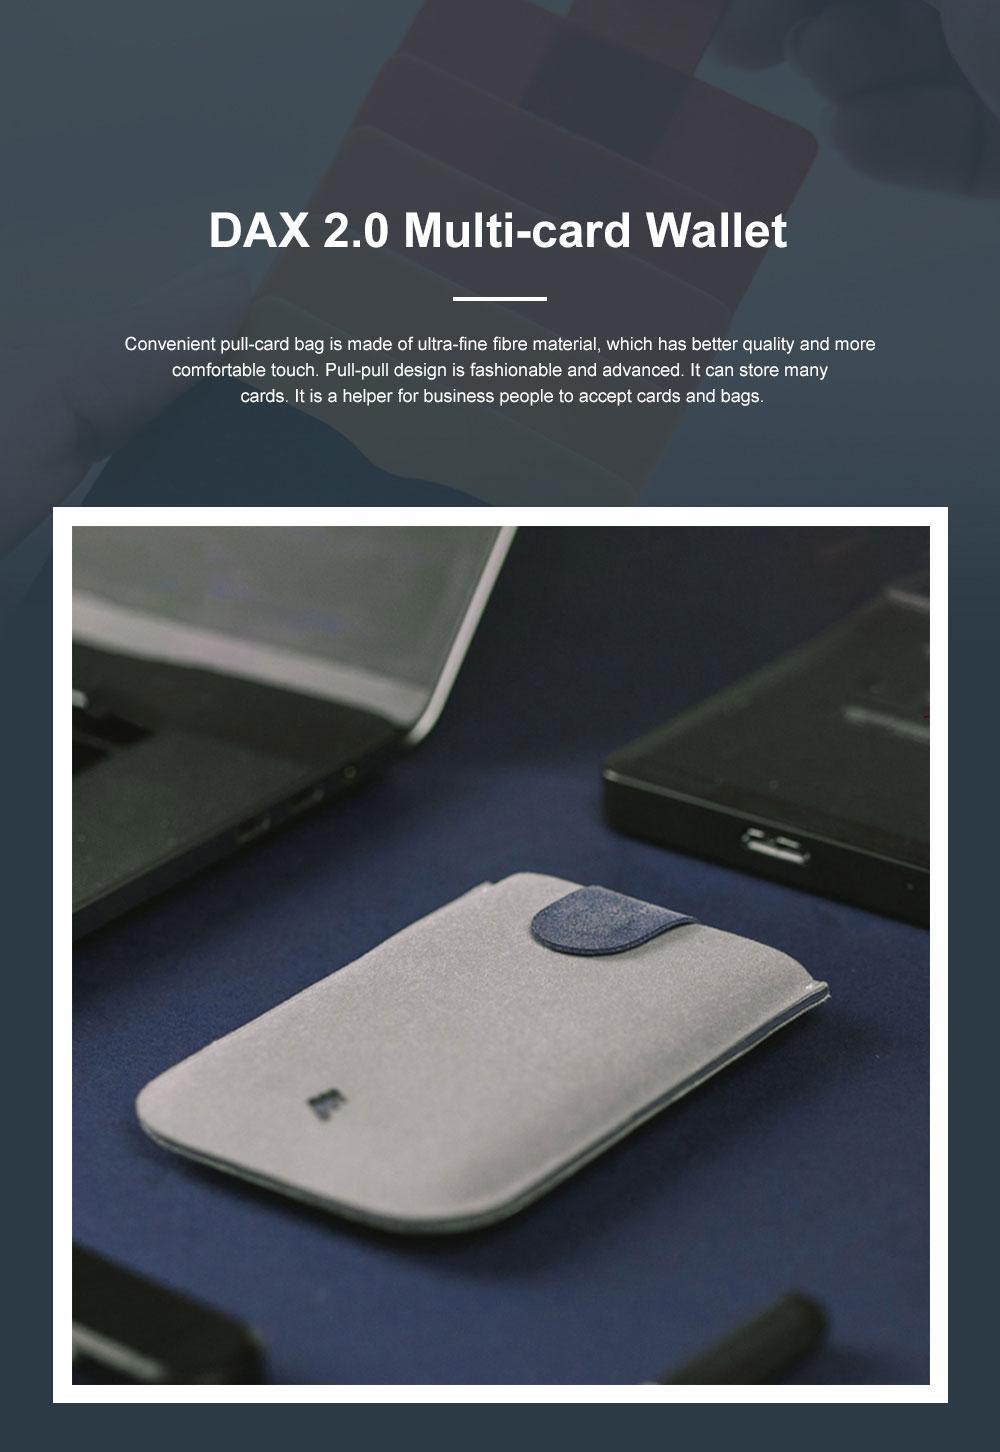 DAX 2.0 Multi-card Wallet Cascading Progressive Fashion Multi-card Wallet Men's and Women's Wallets 0